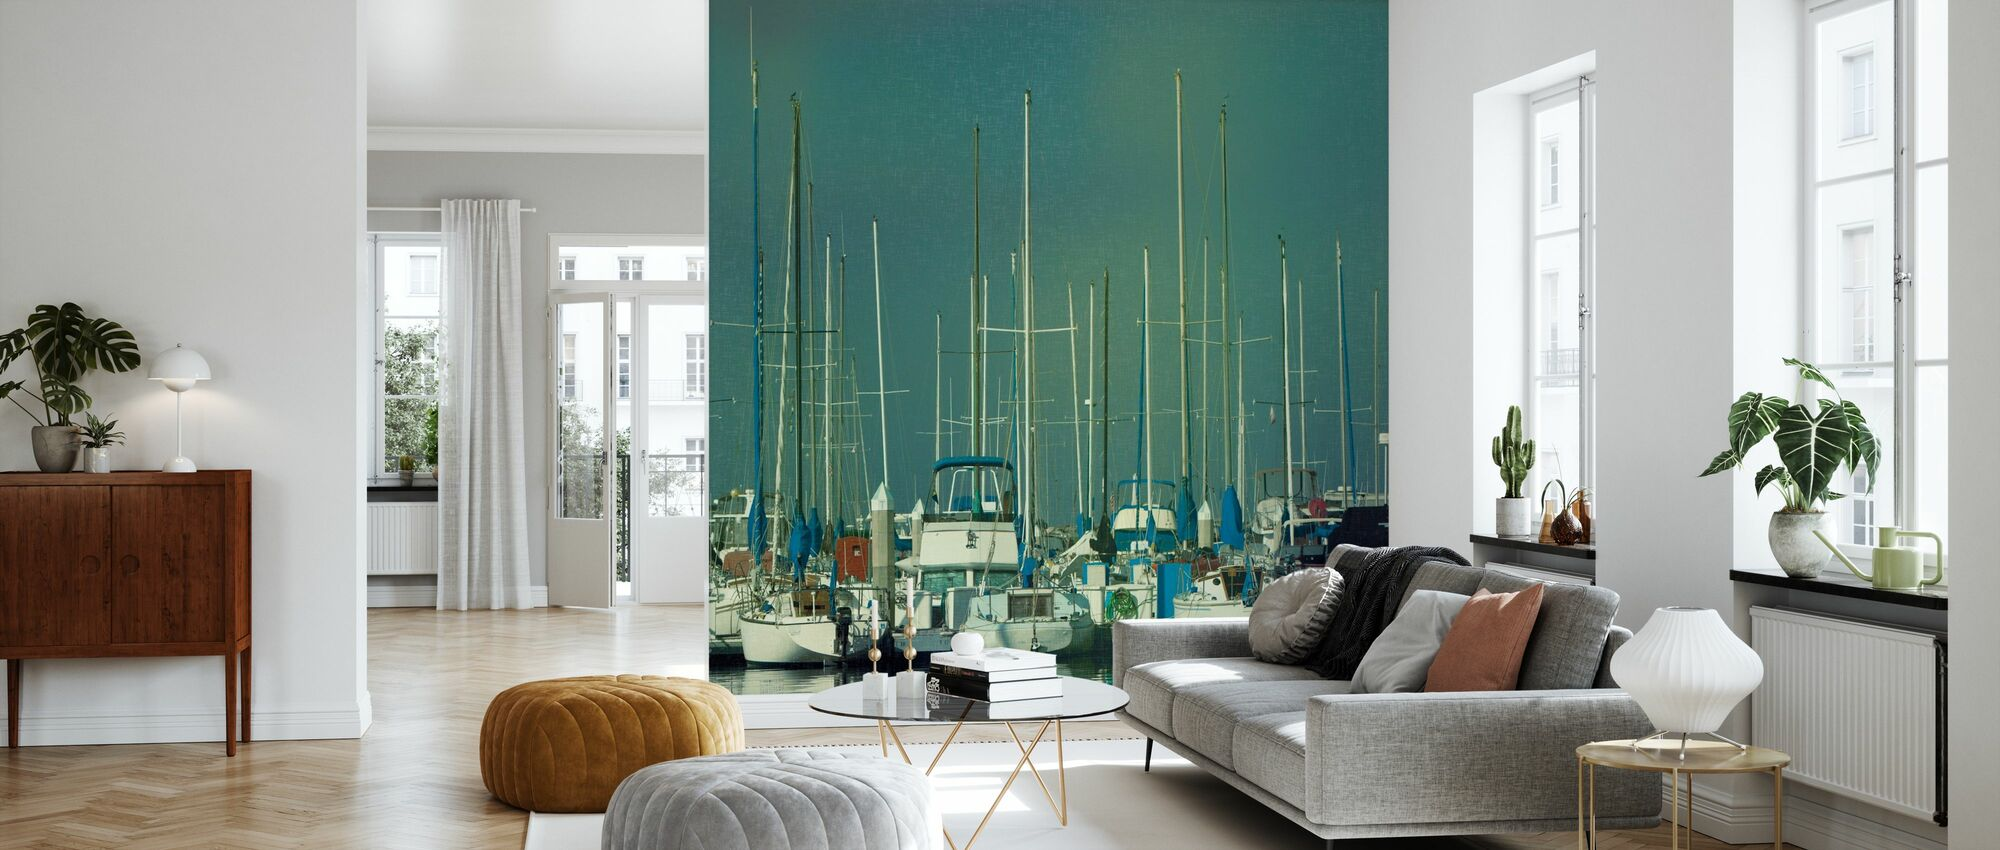 Harbor Boats - Wallpaper - Living Room